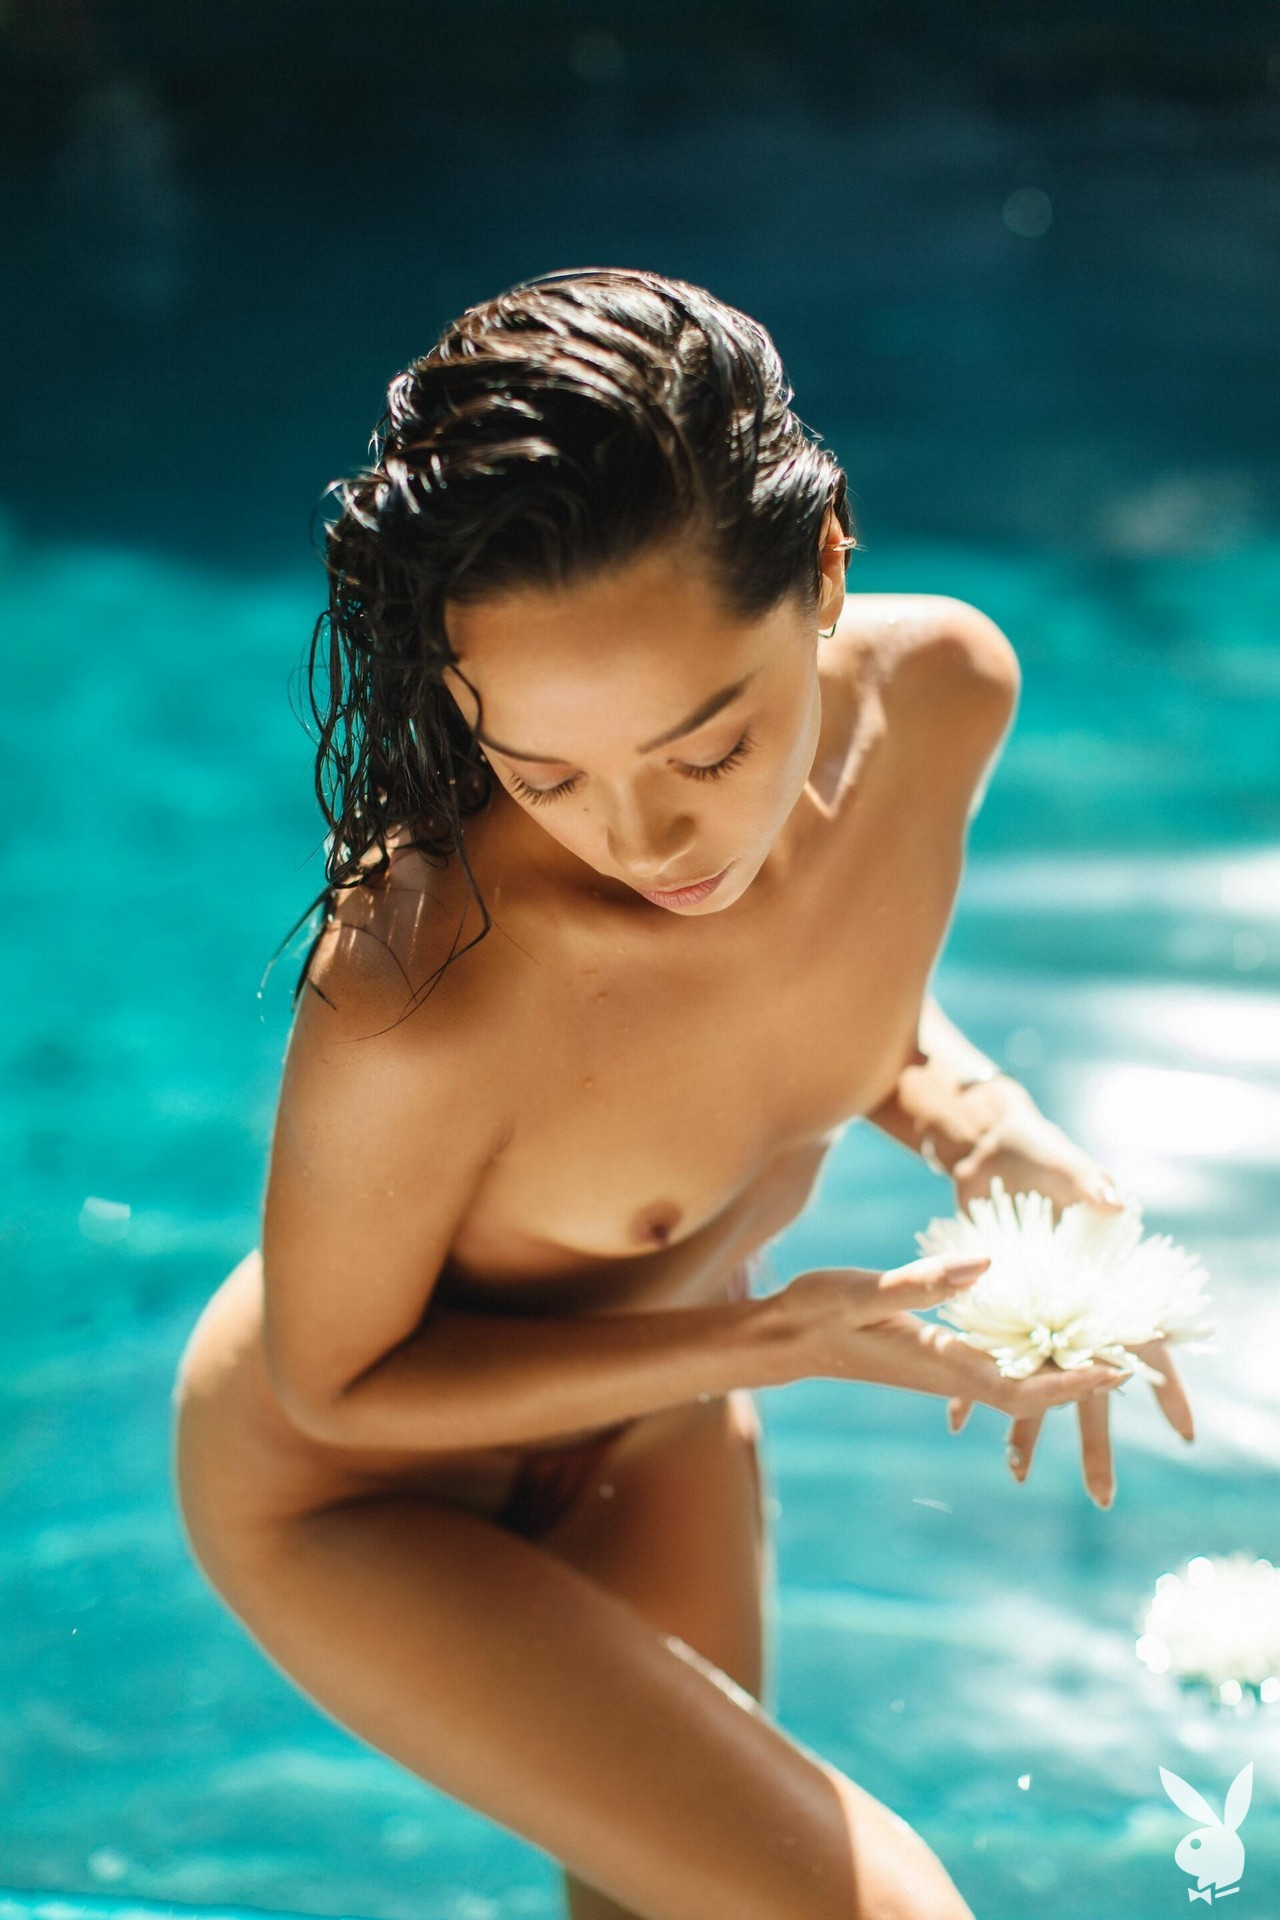 Playmate September 2020 Danielle Alcaraz Playboy Plus (42)